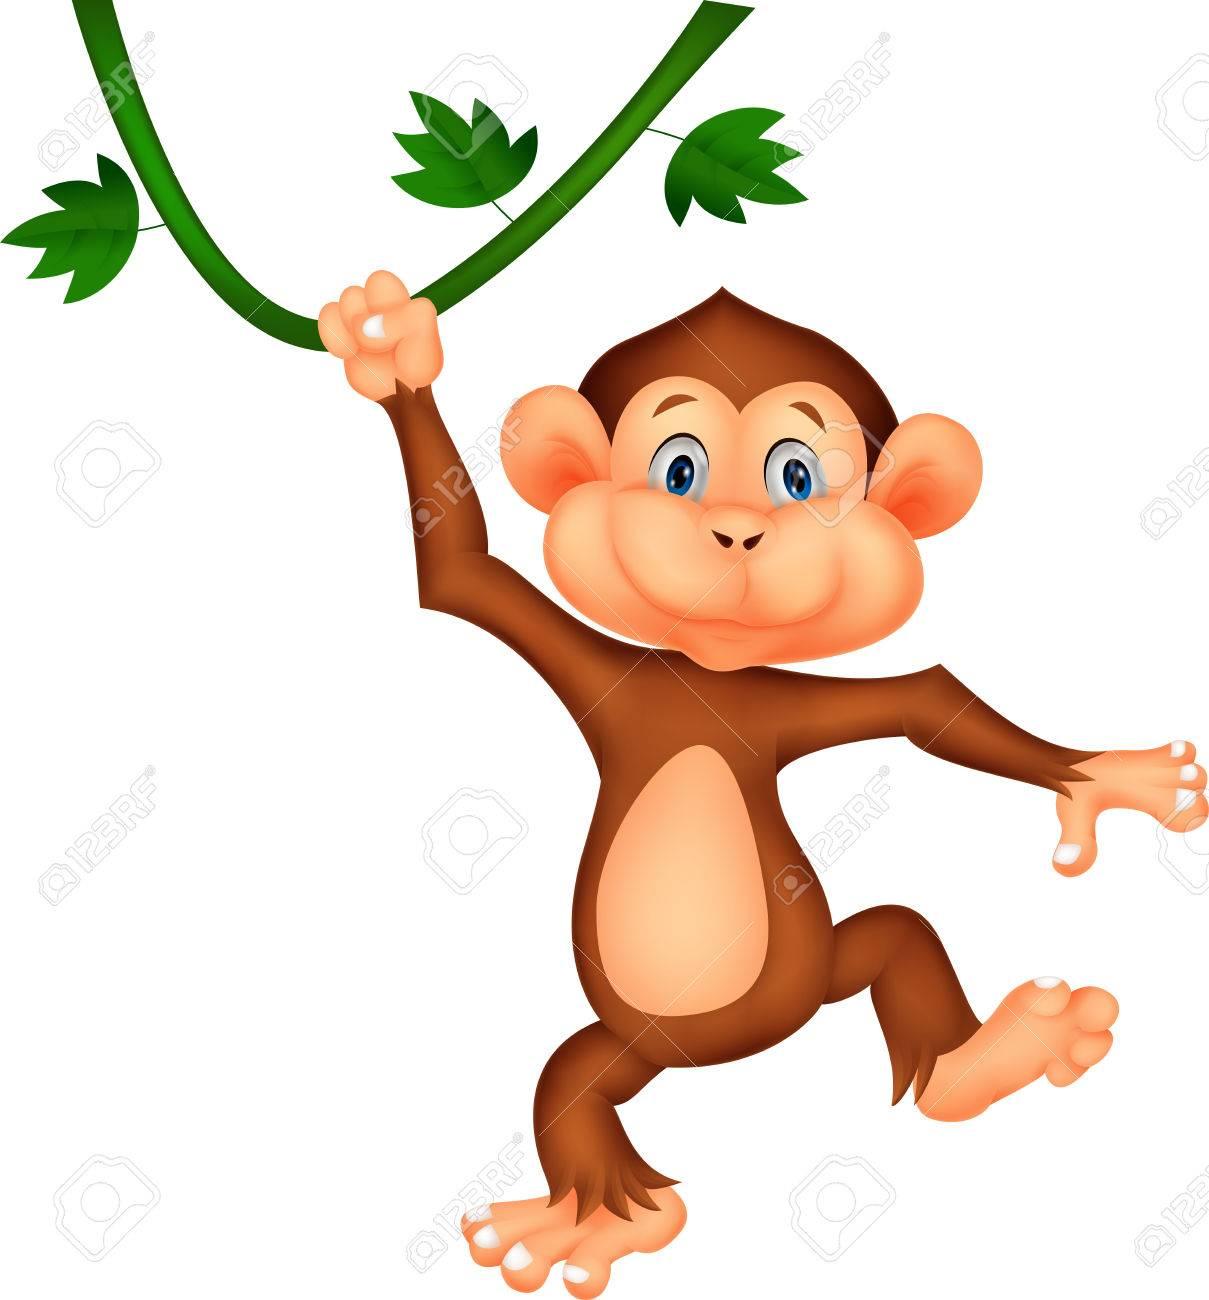 Cute monkey cartoon hanging Stock Vector - 23517242